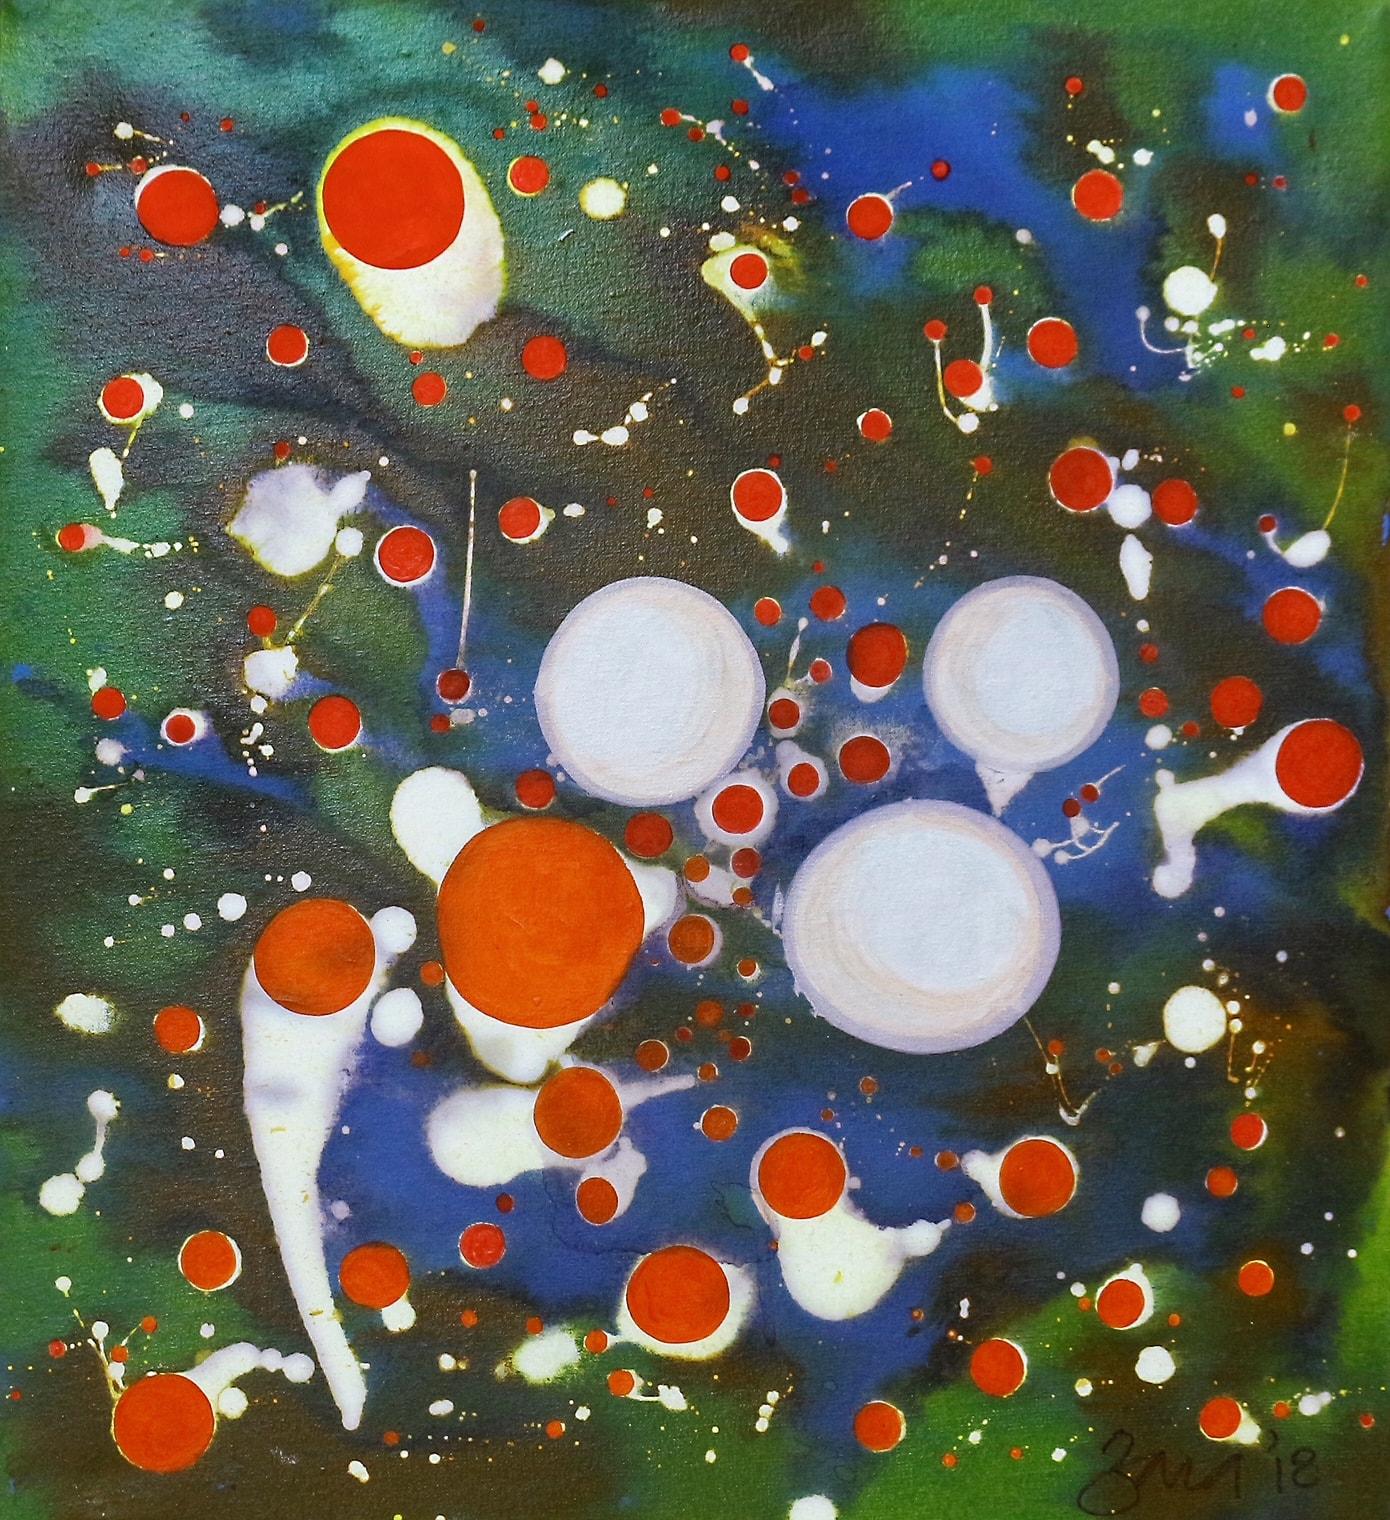 Dissociated II, 18 x 20 Inch, Mixed Media on Canvas, AC-ZRK-018